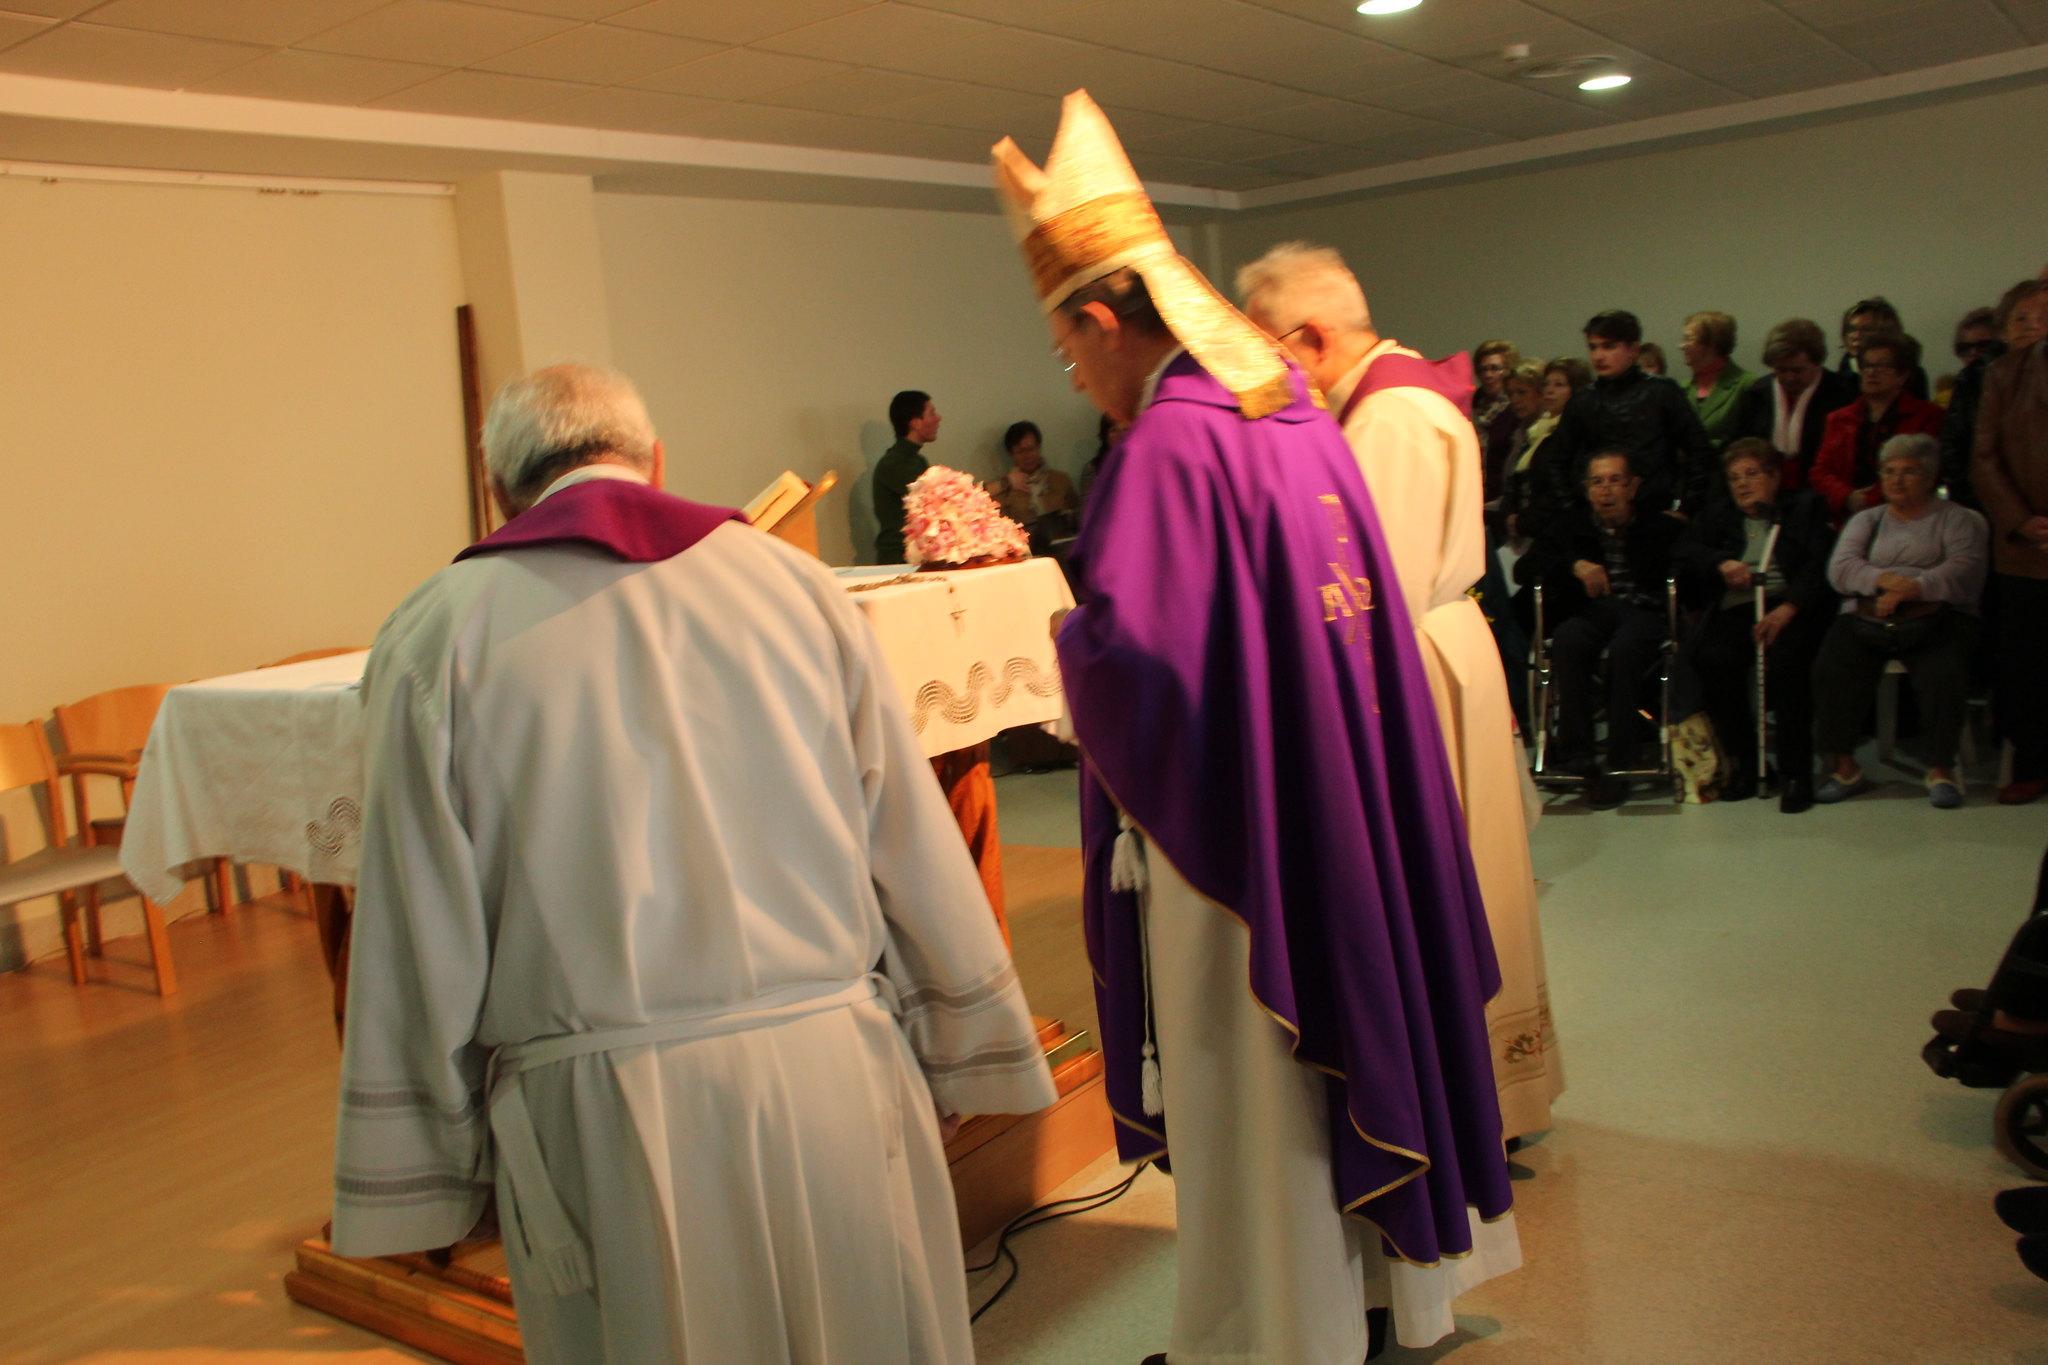 (2016-02-13) - Inauguración Virgen De Lourdes, La Molineta - Archivo La Molineta (056)